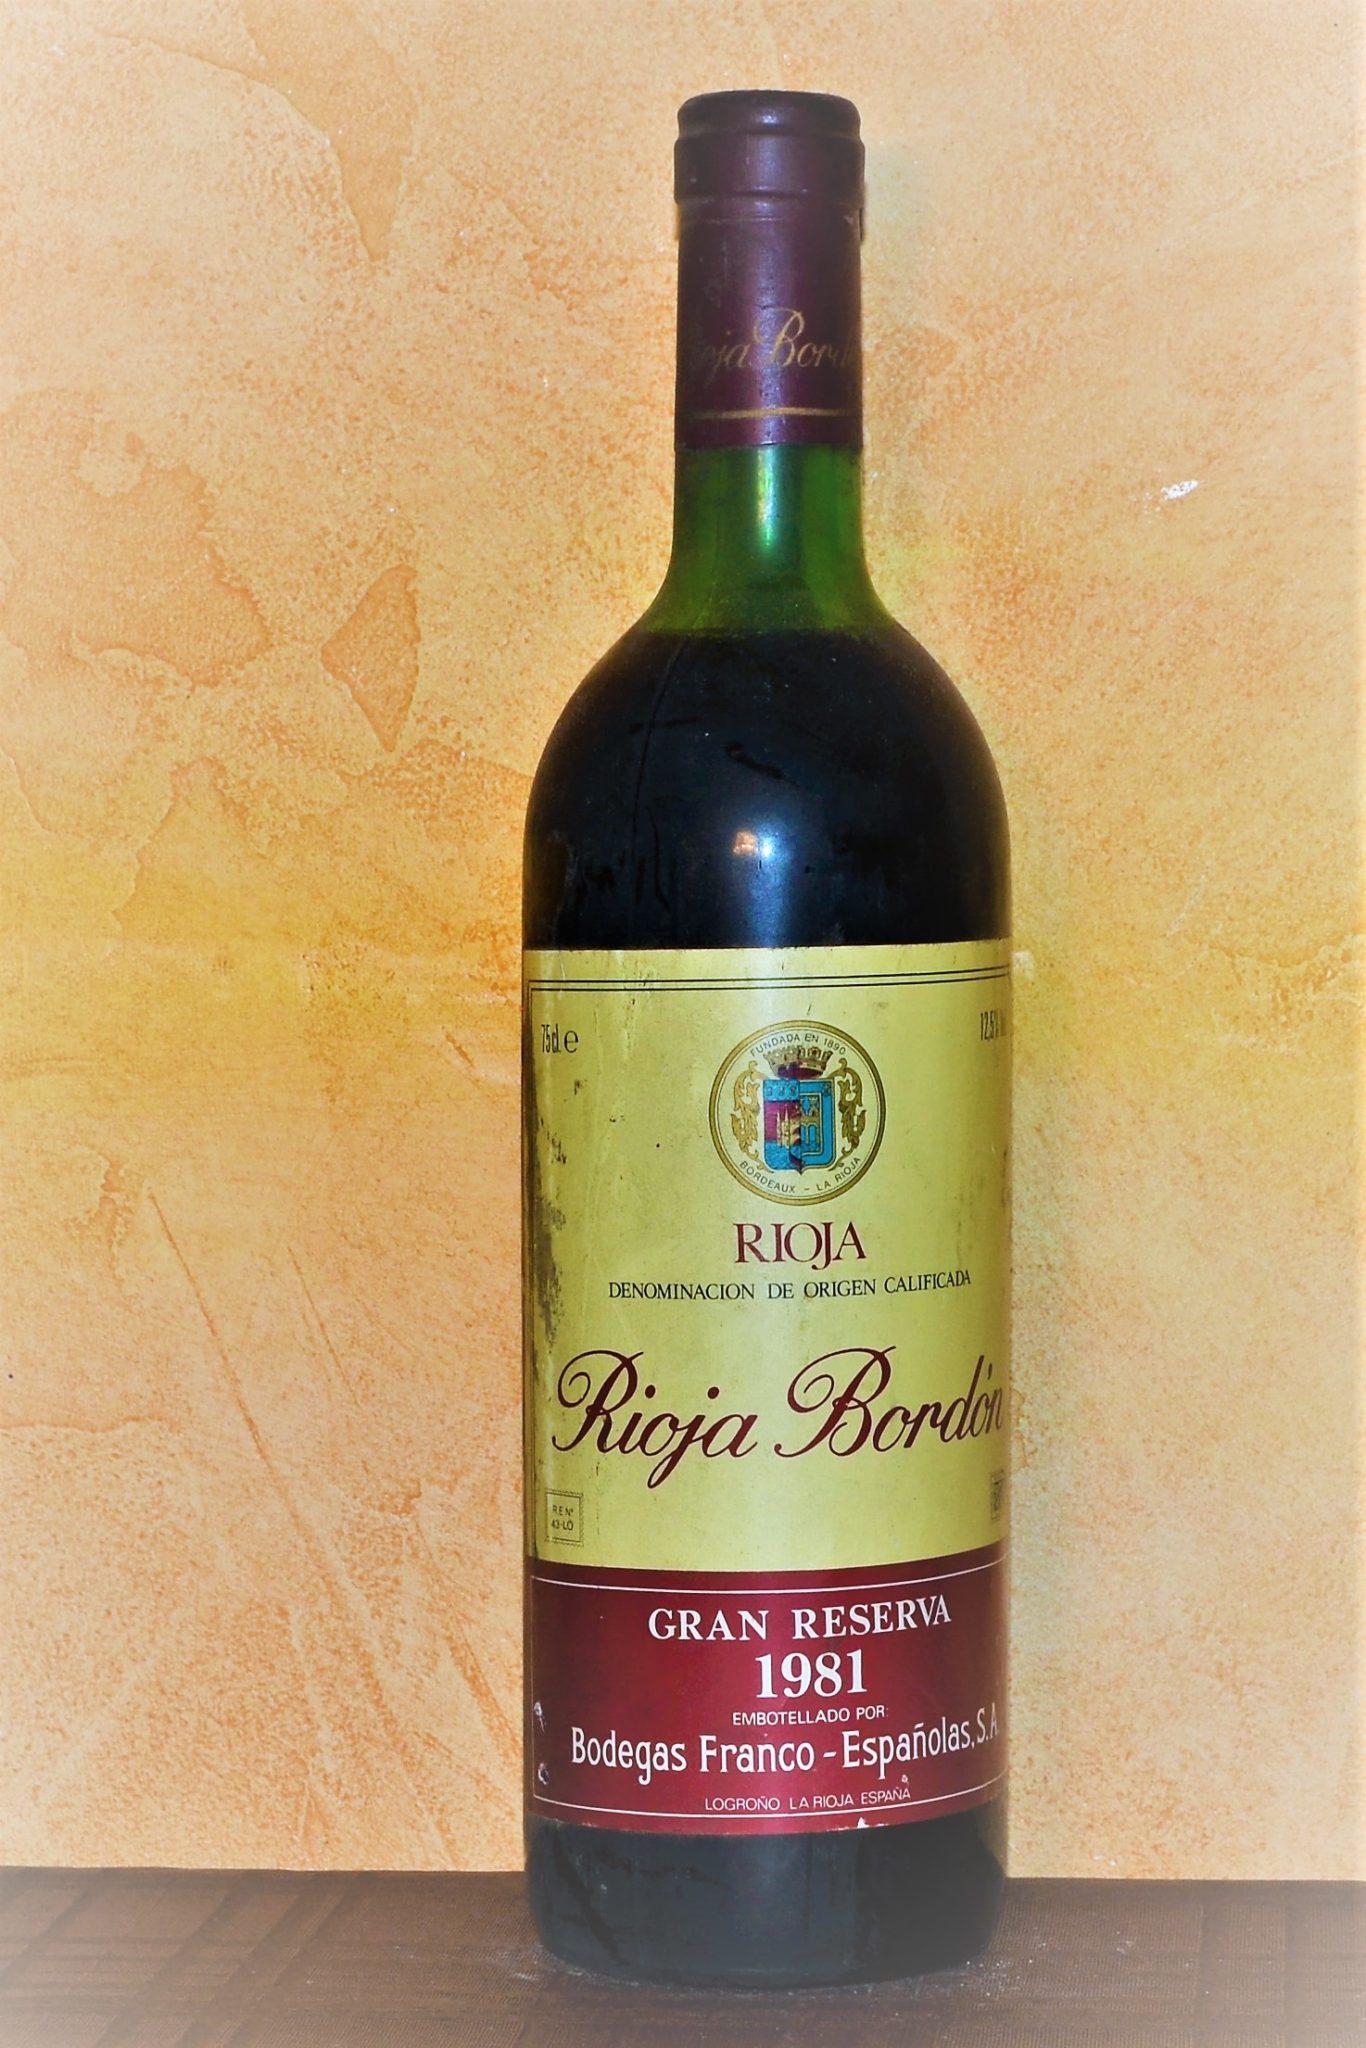 Rioja Bordón Gran Reserva 1981